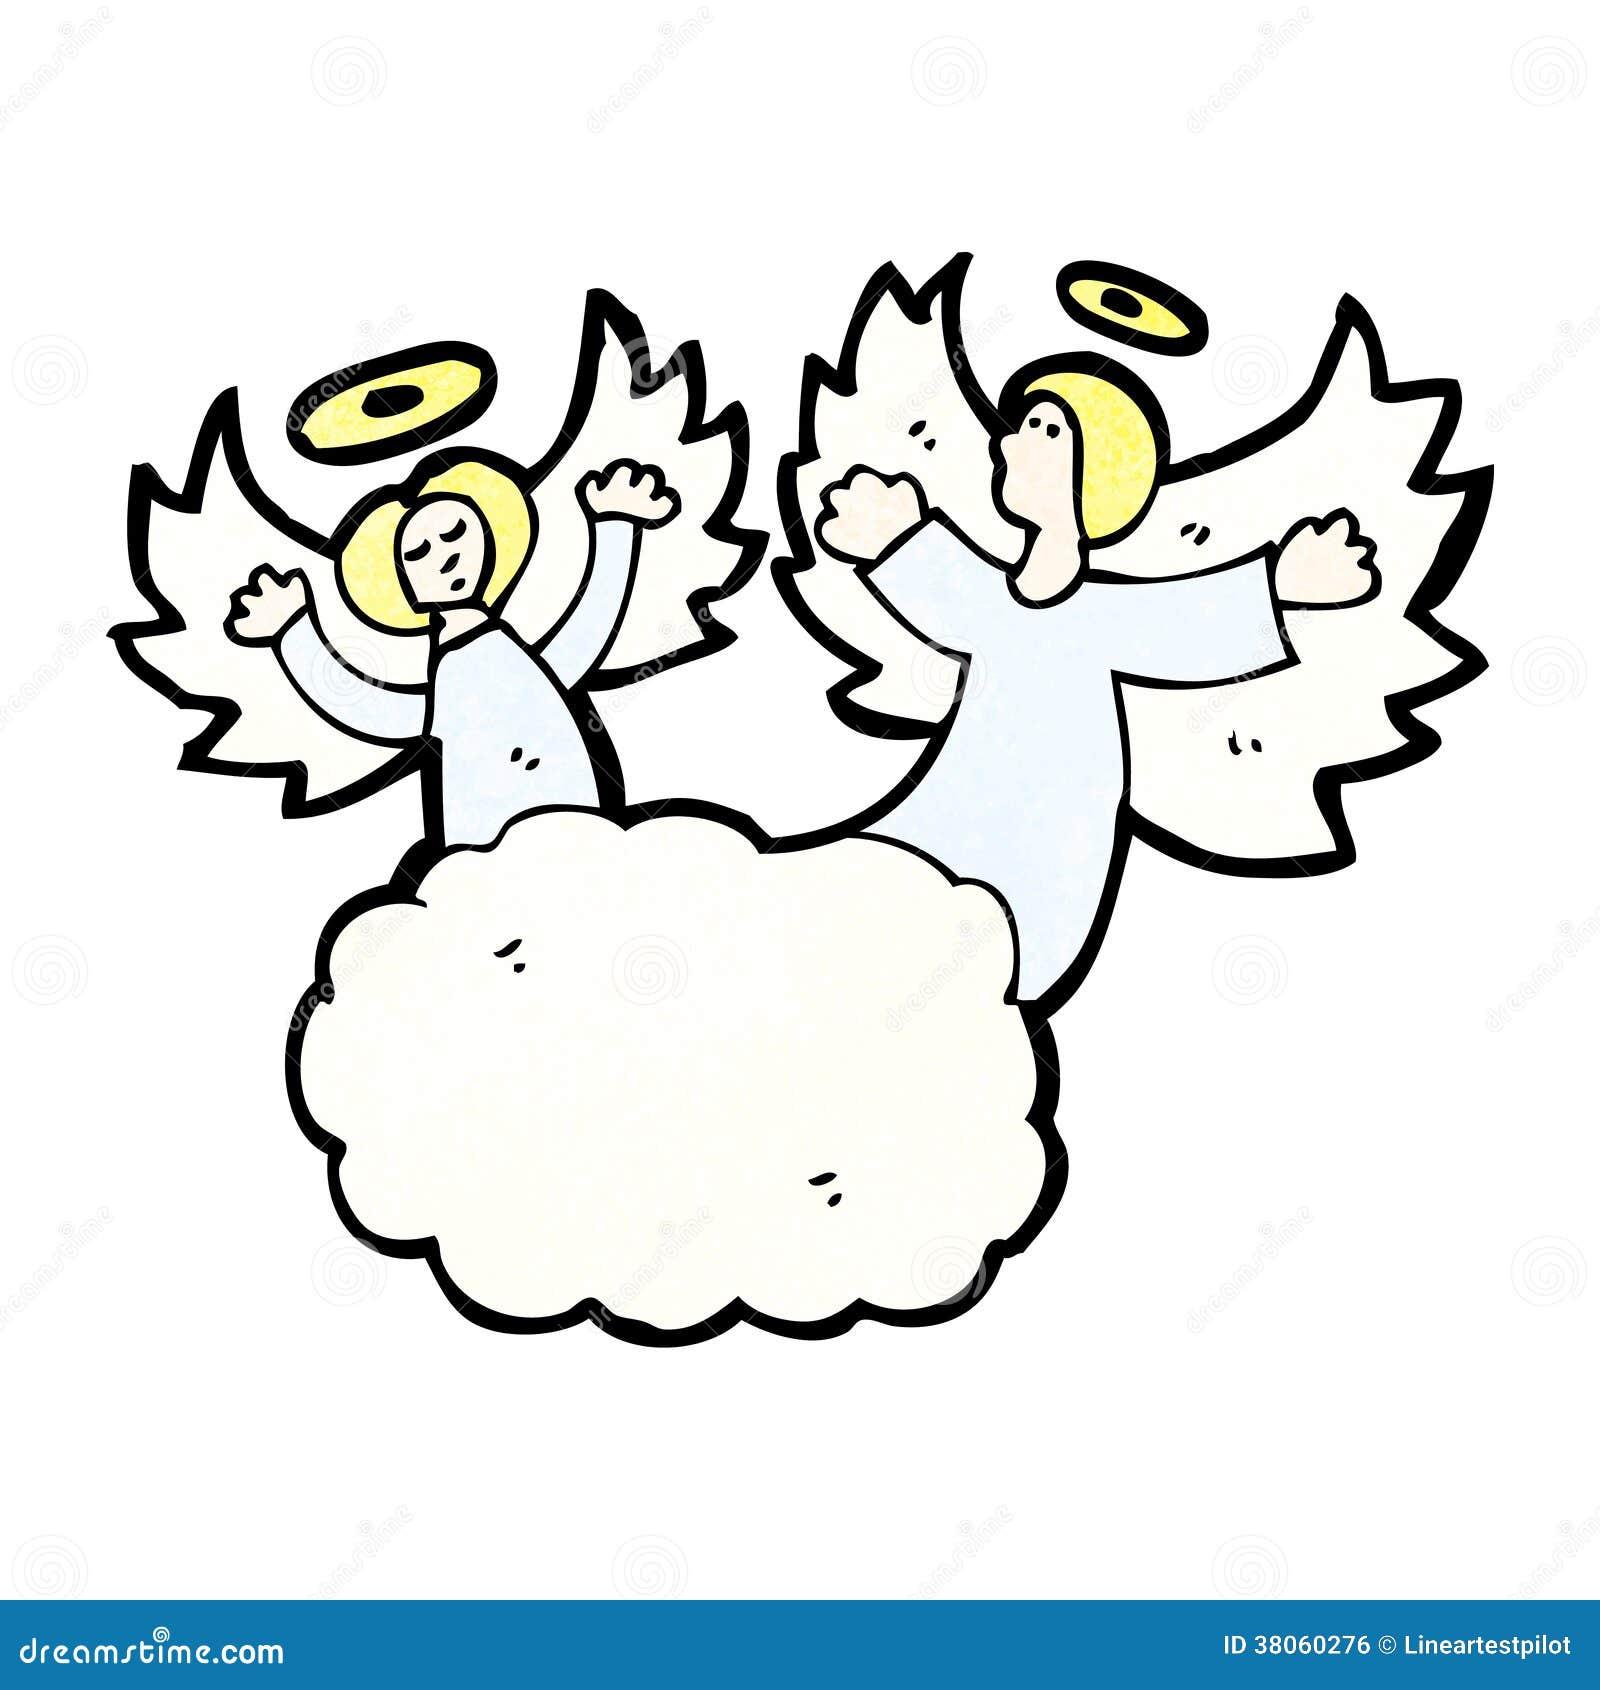 1300 x 1390 jpeg 113kB, Cartoon Angels In Heaven Royalty Free Stock ...